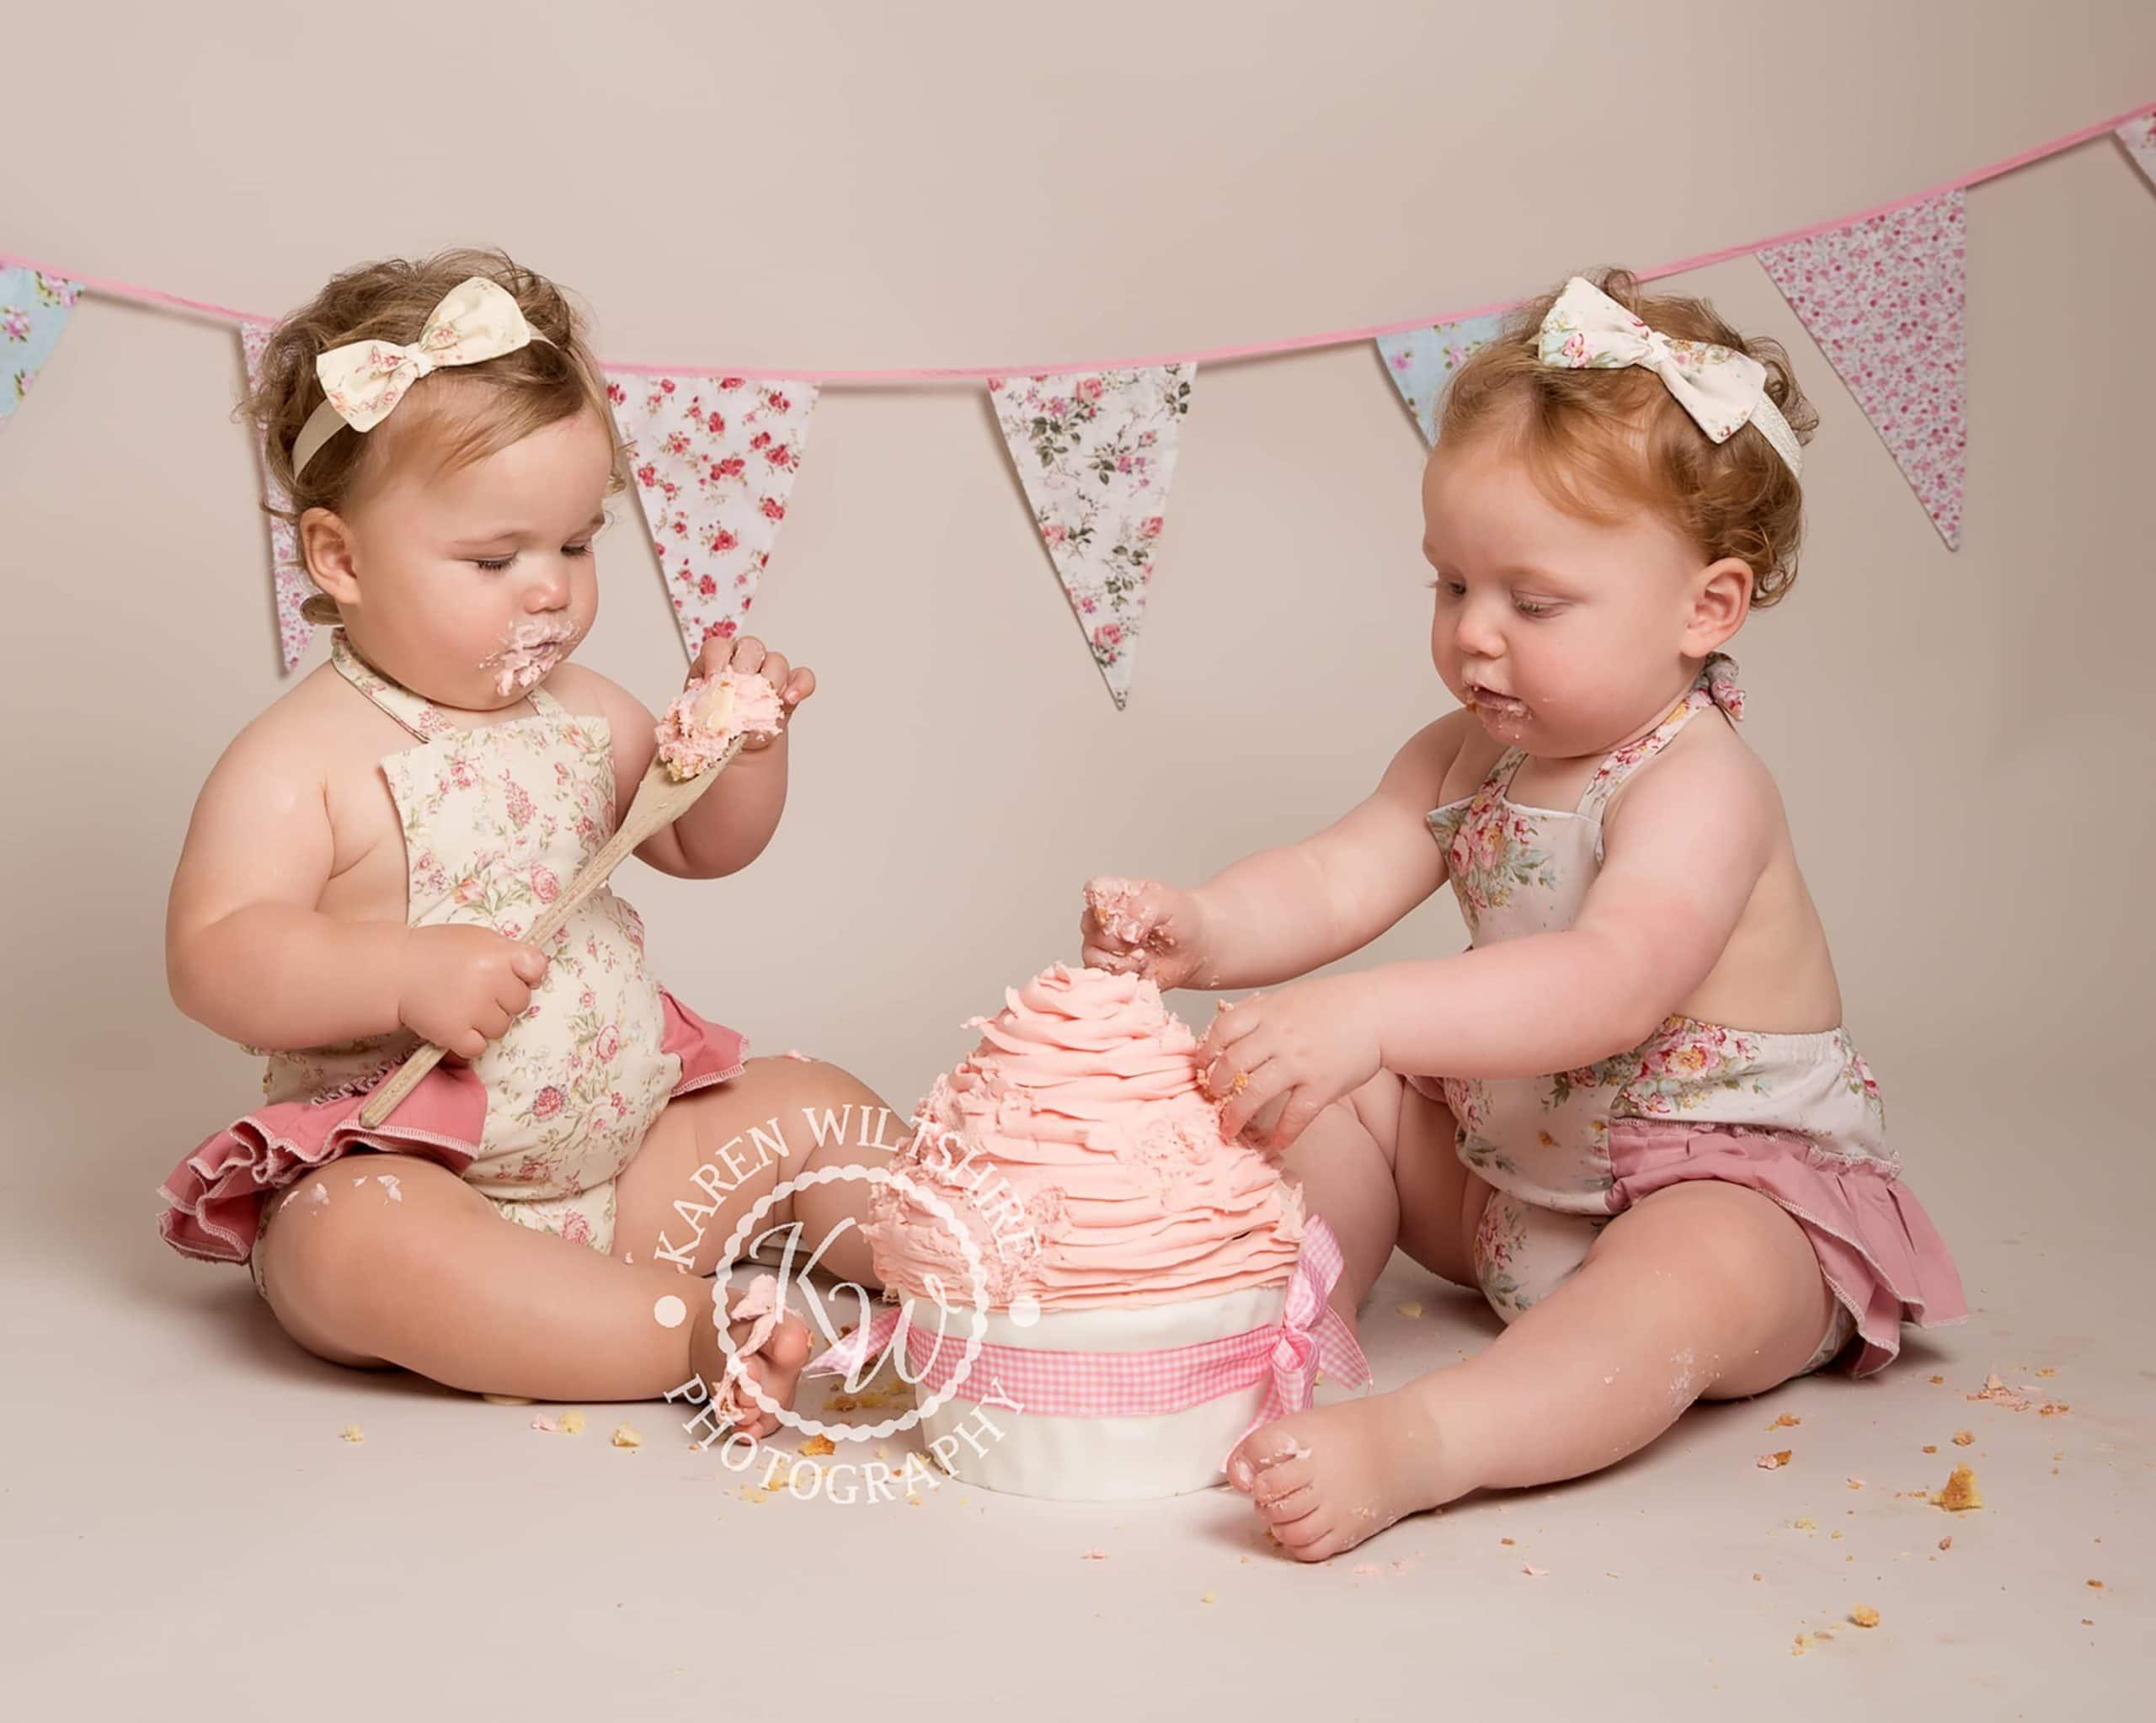 twin girl cake smash photo shoot